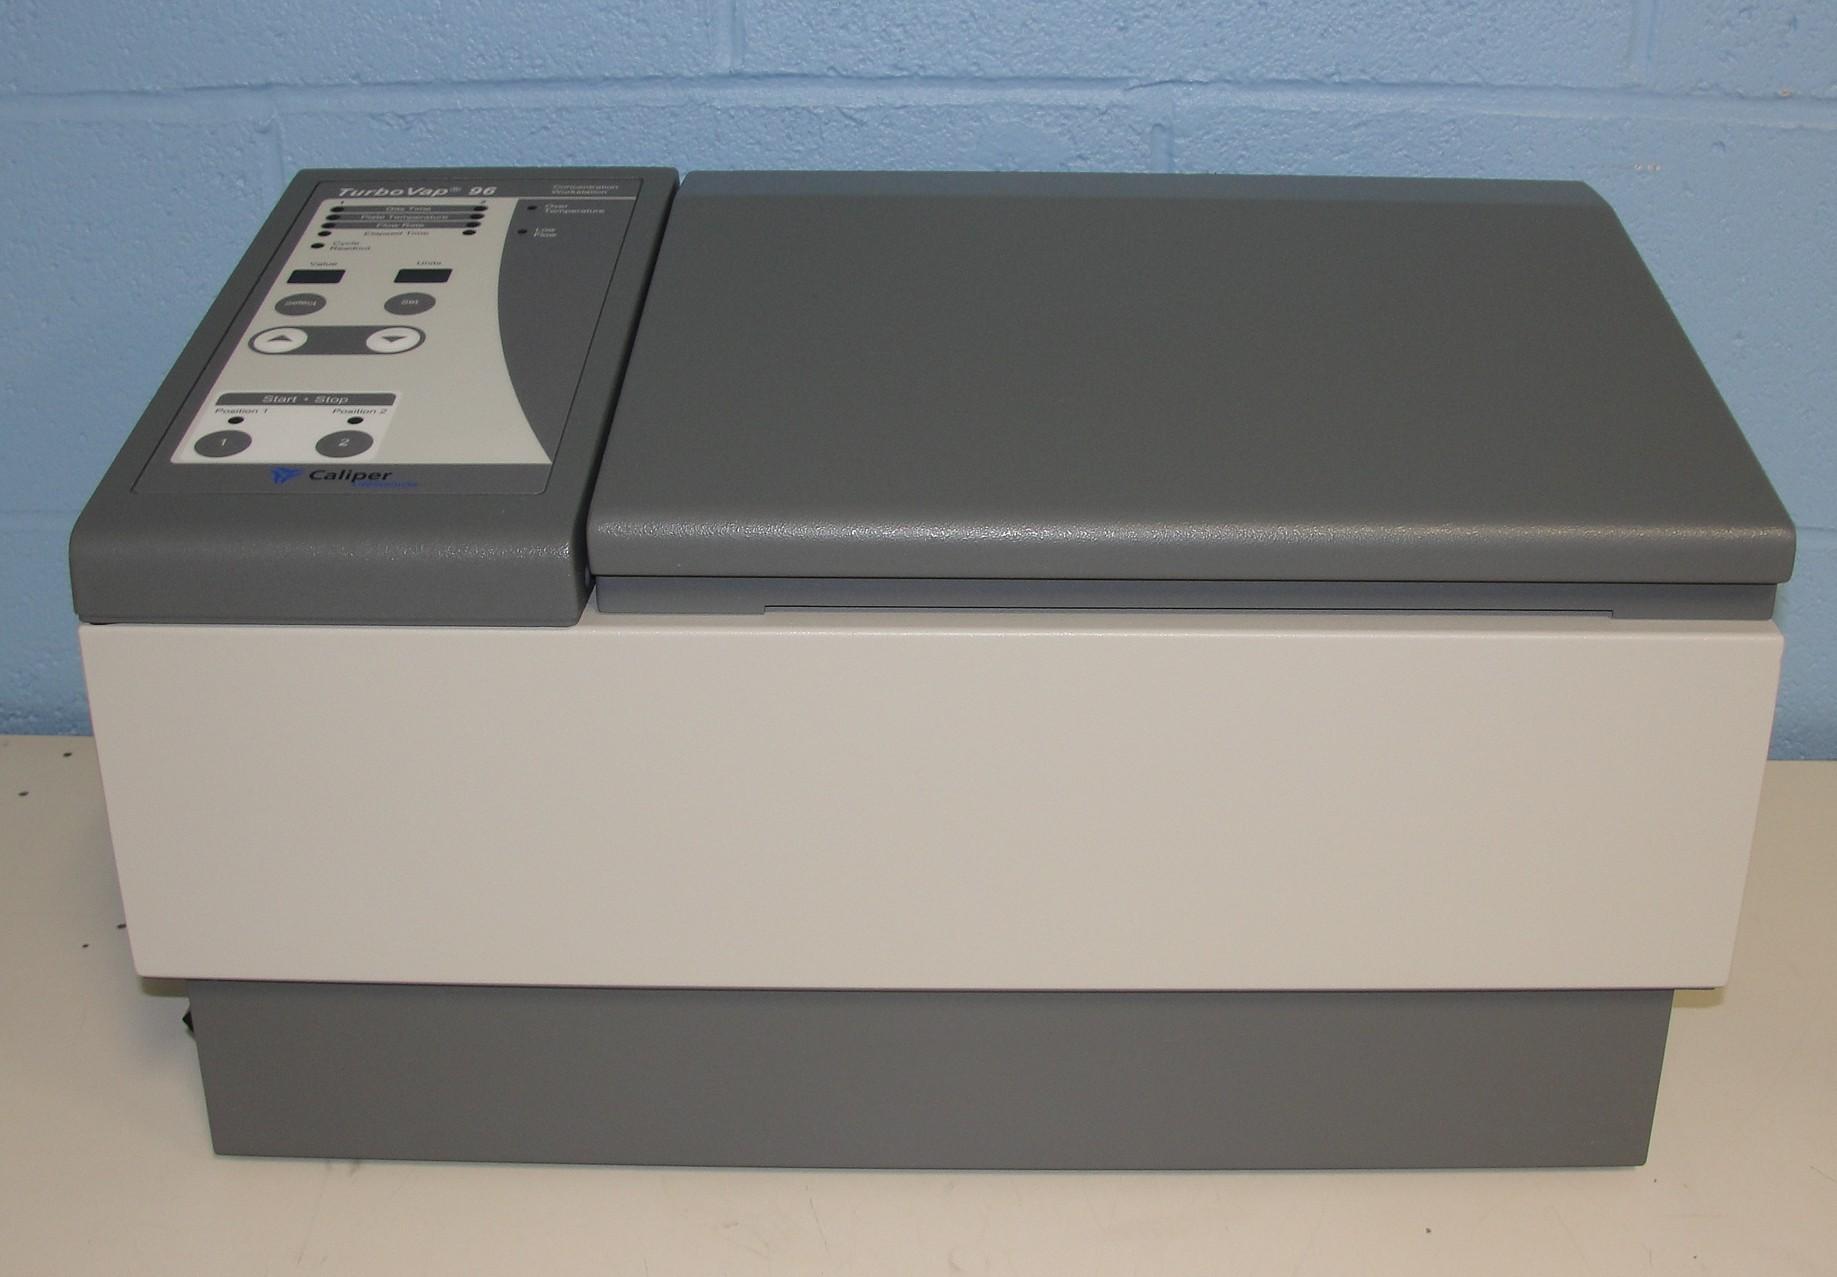 Caliper Life Sciences TurboVap 96 Concentration Evaporator Workstation Image